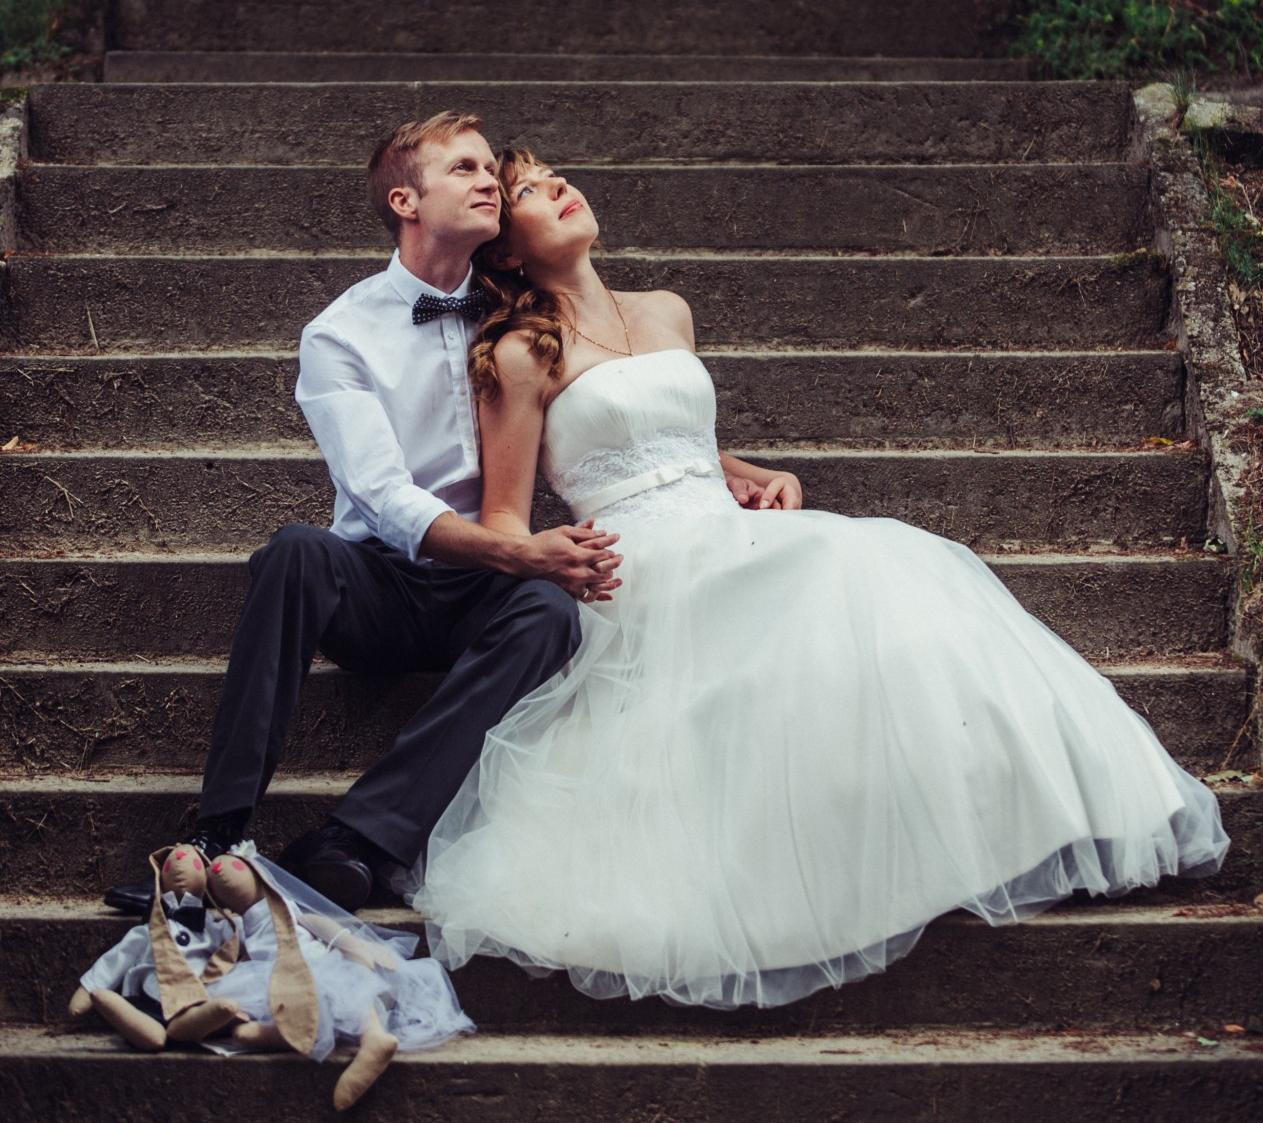 Ślub po dwóch tygodniach randek